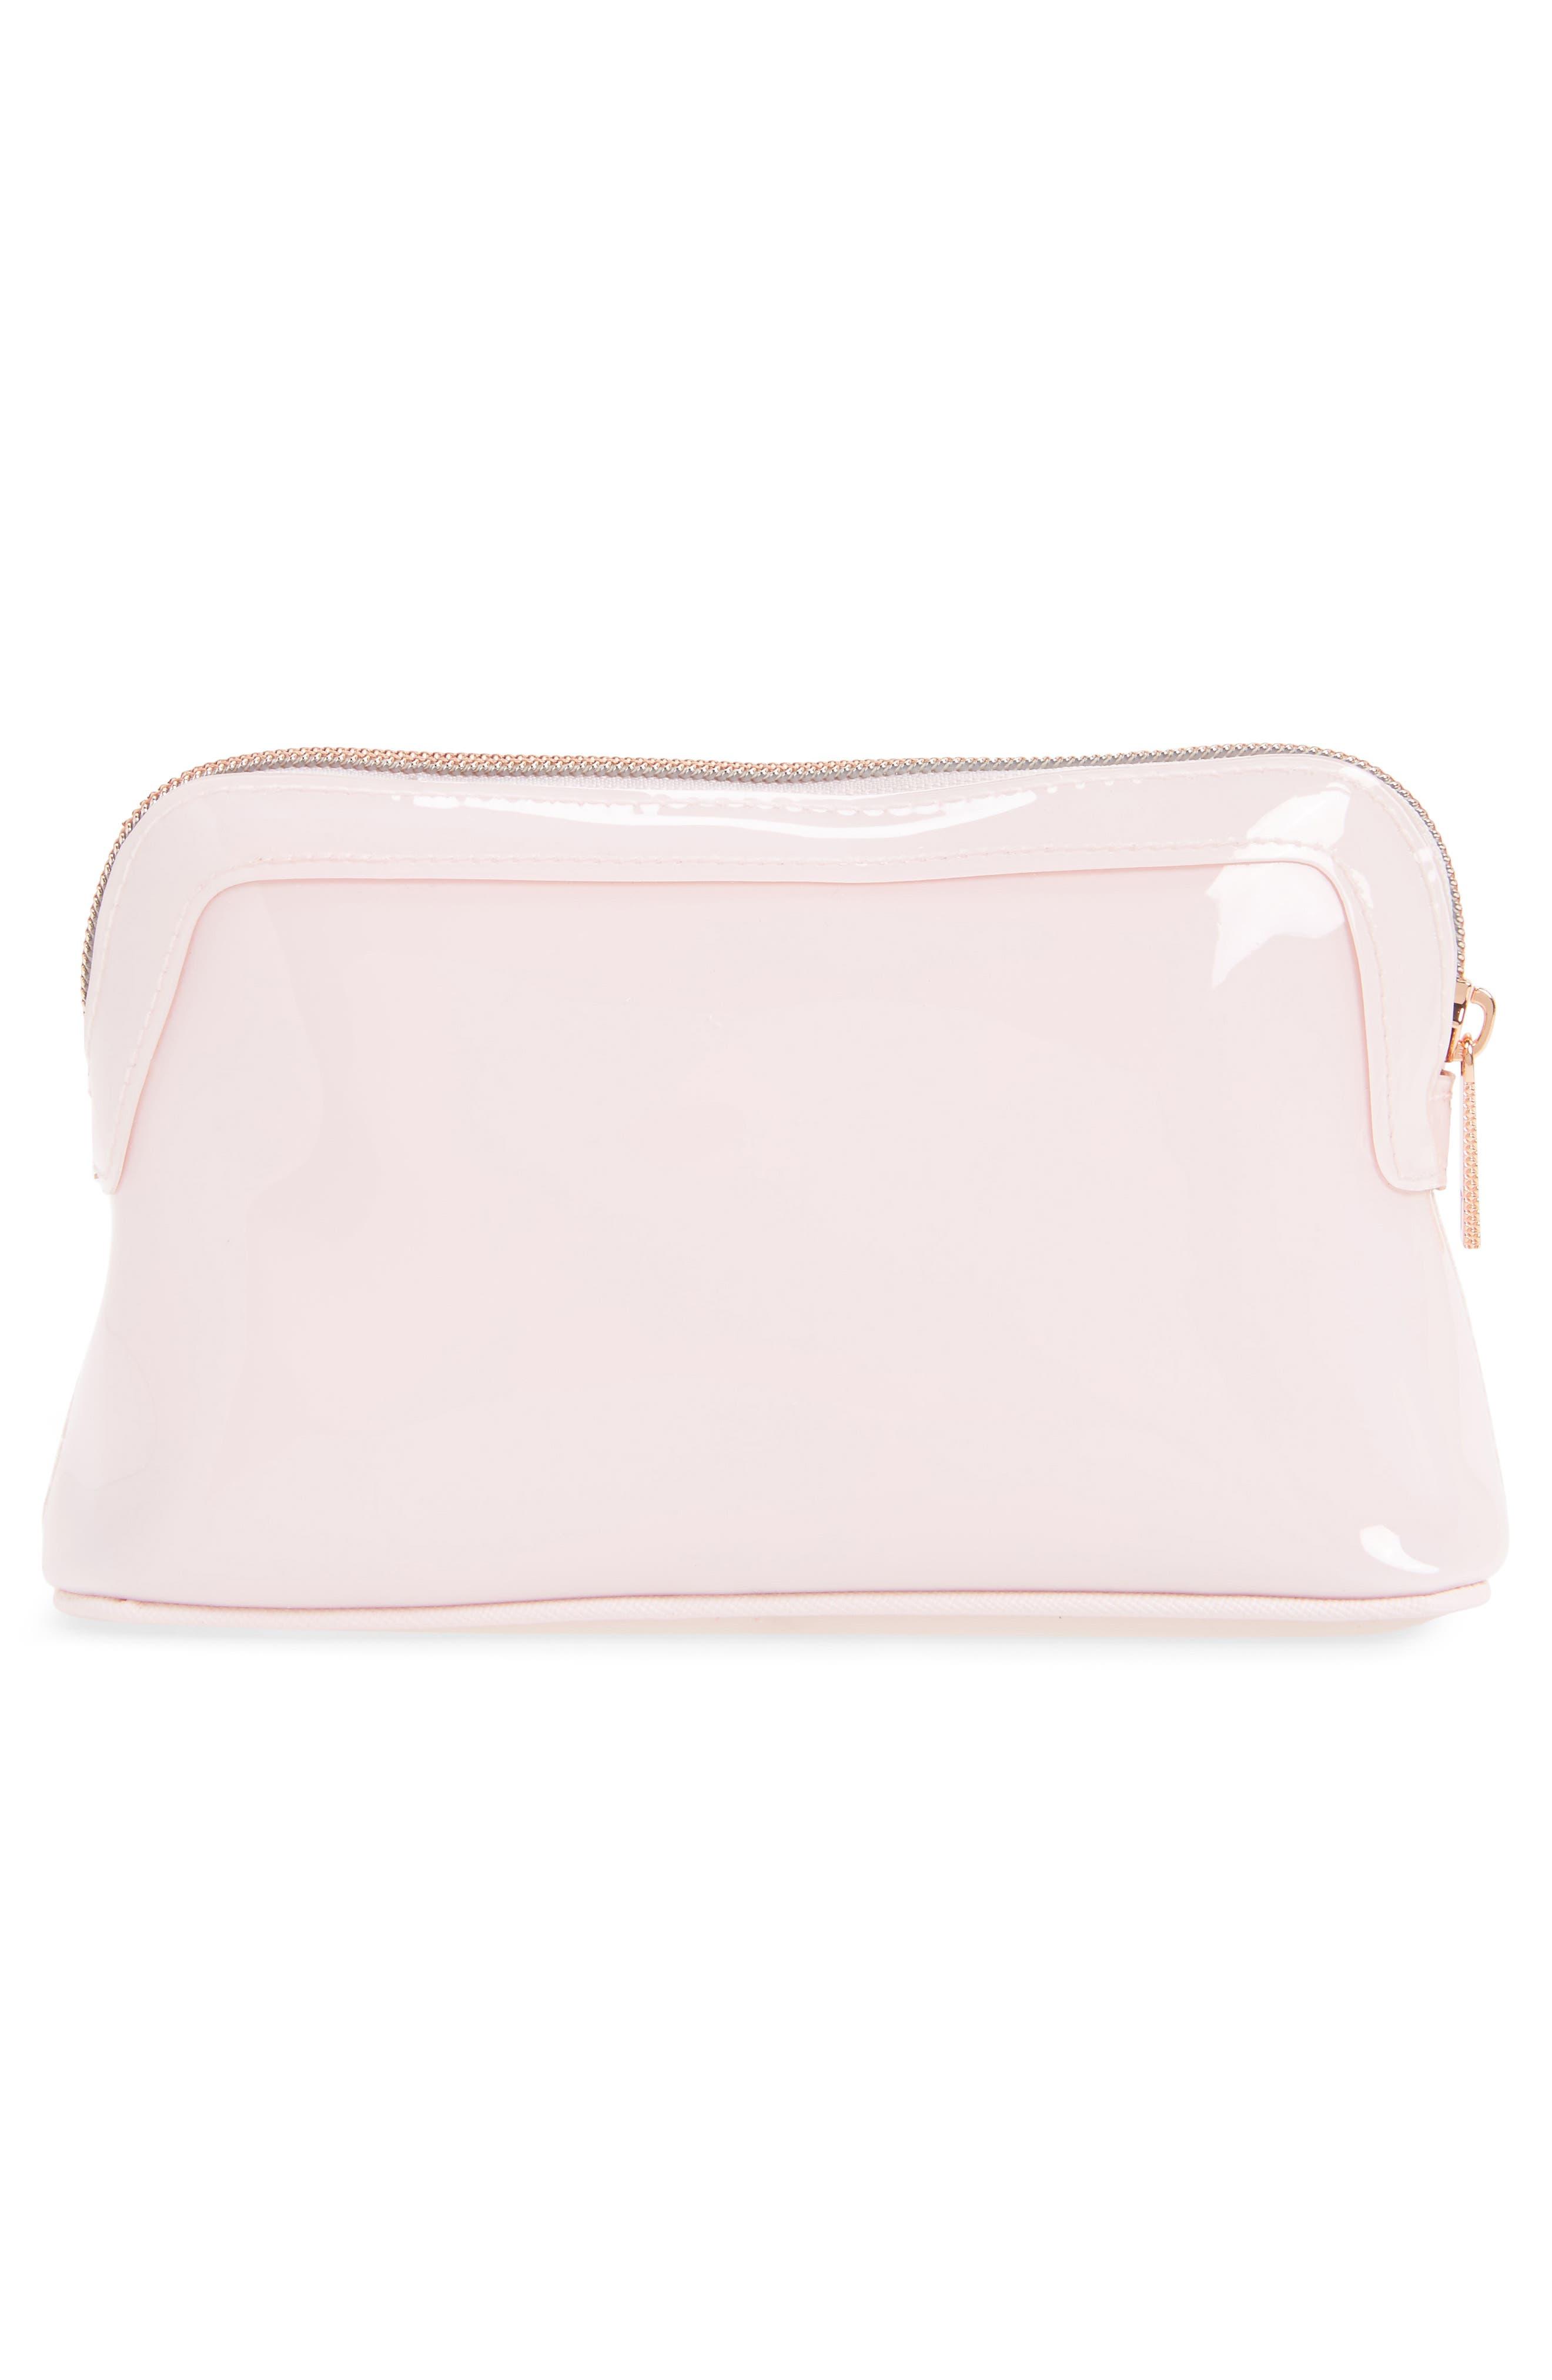 Julis Bow PVC Cosmetics Case,                             Alternate thumbnail 2, color,                             Dusky Pink